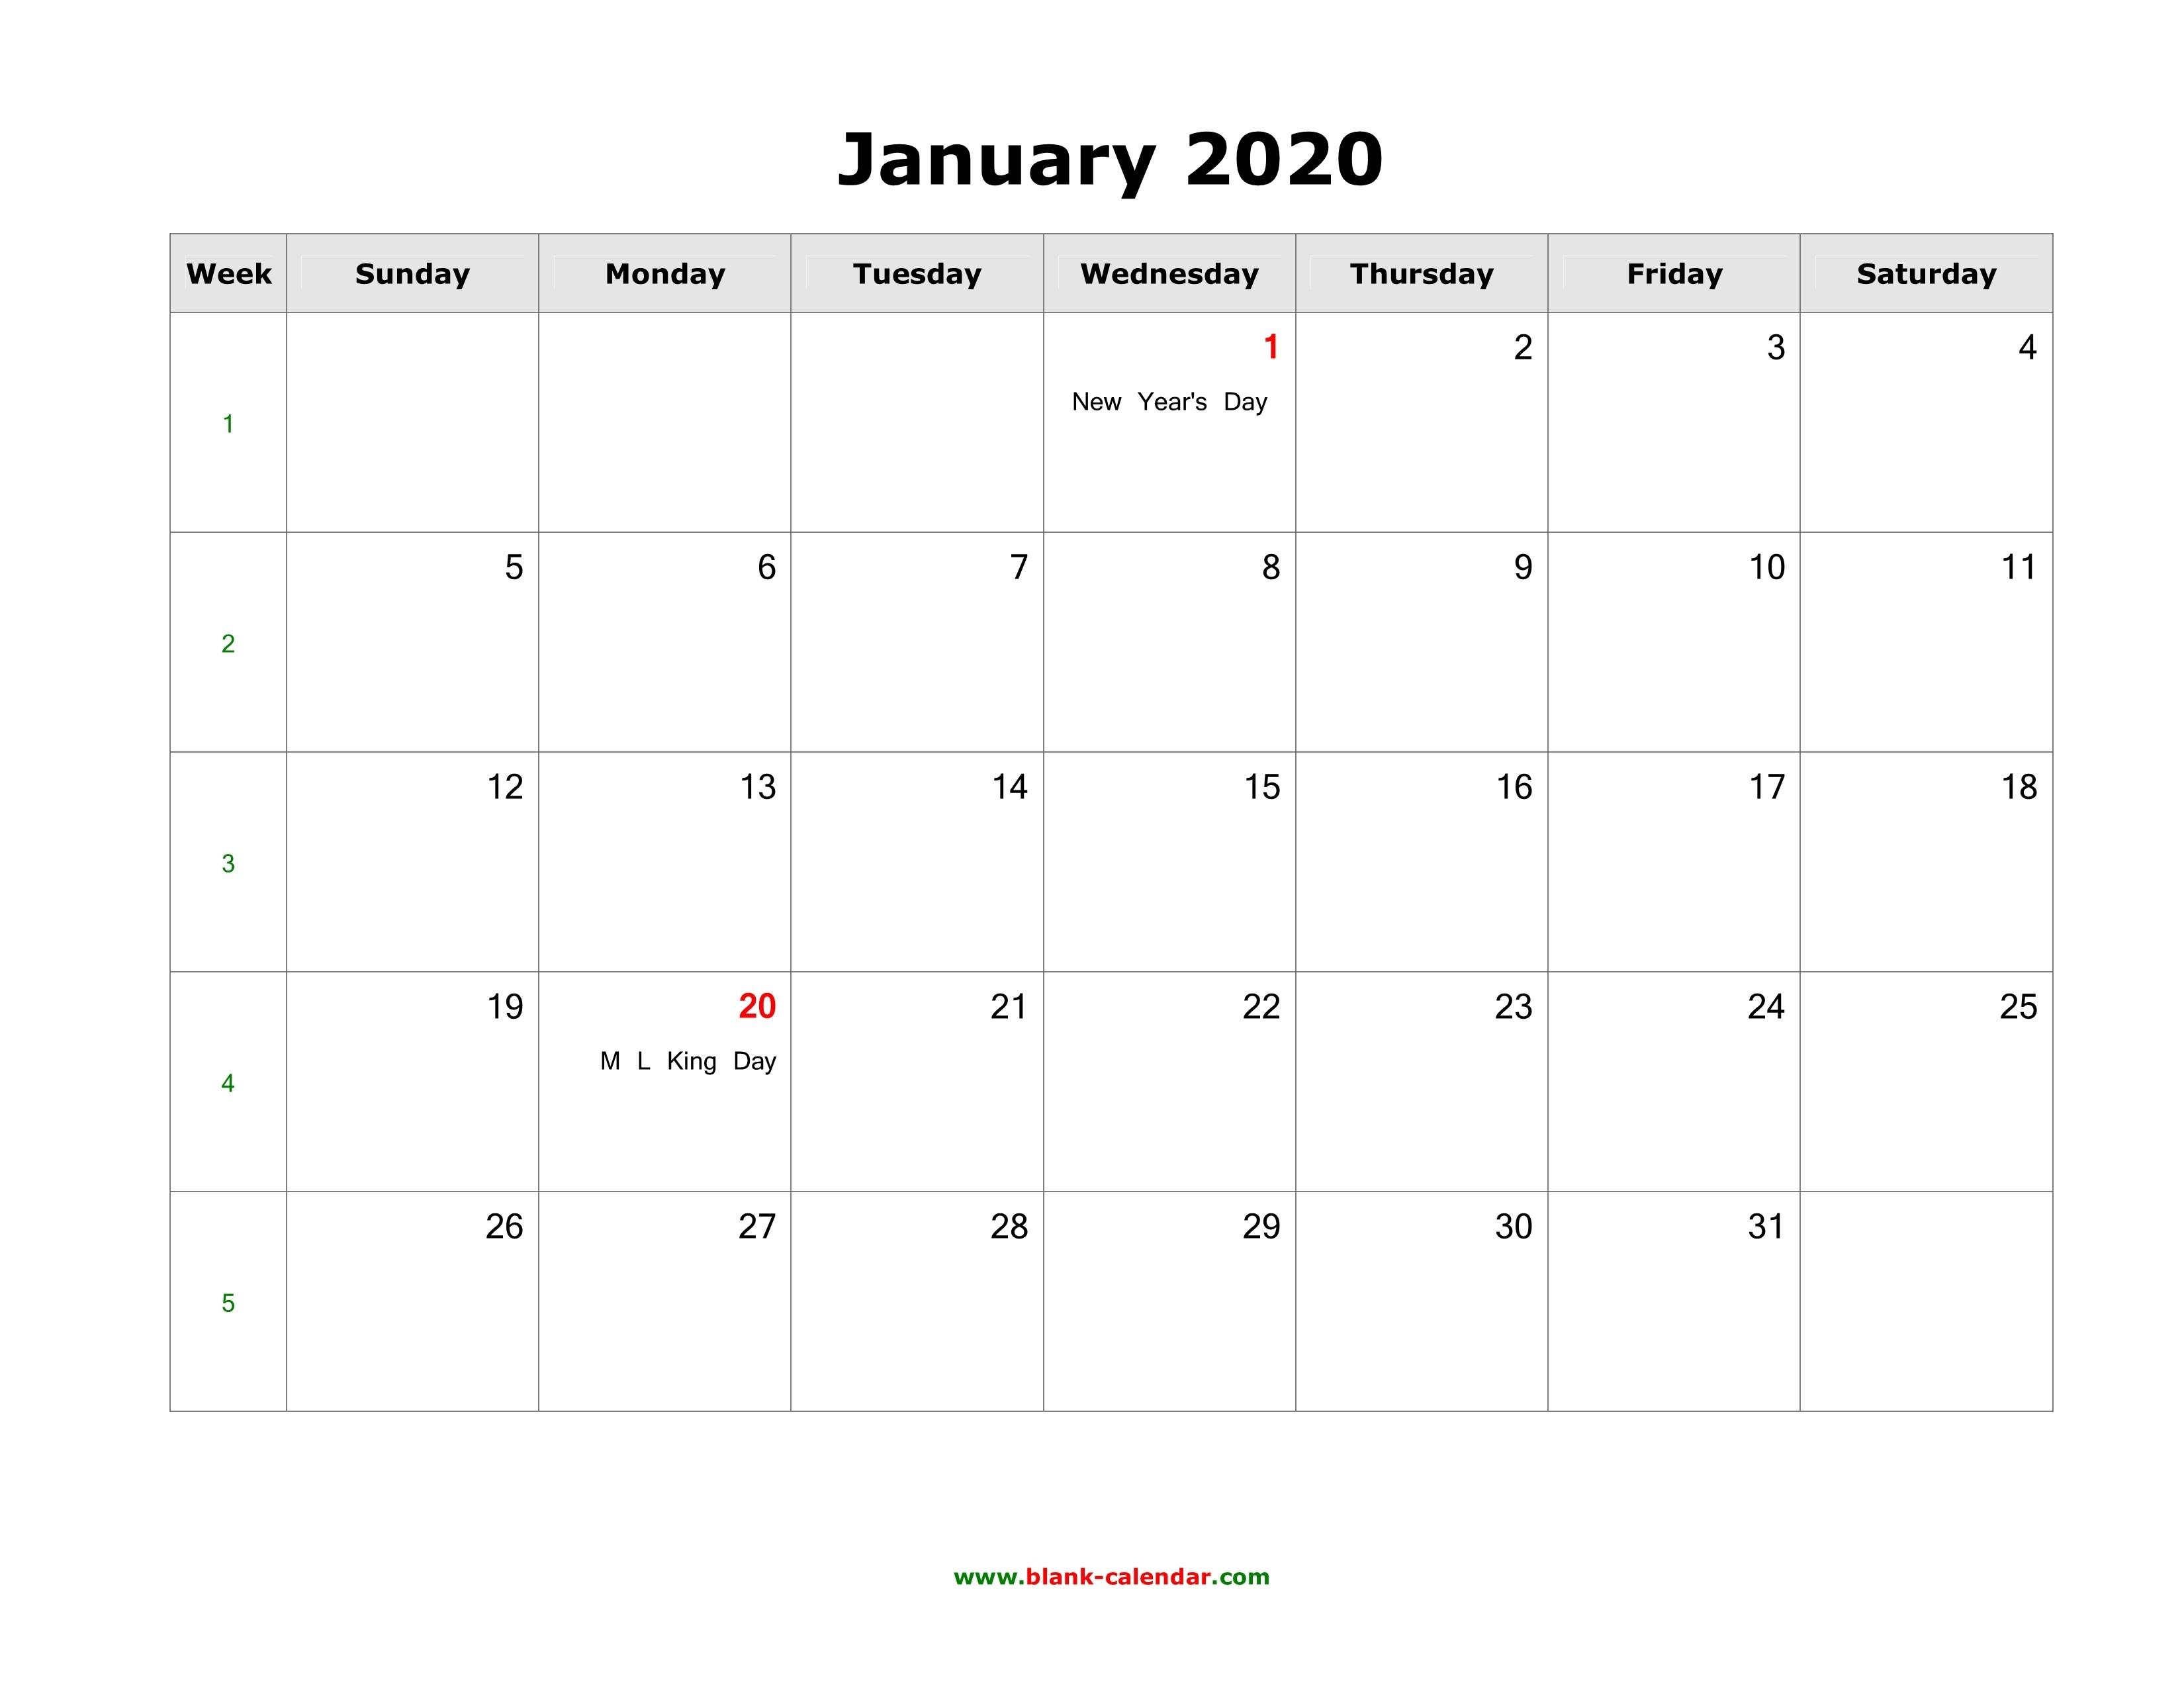 January 2020 Blank Calendar | Free Download Calendar Templates-January 2020 Calendar Excel